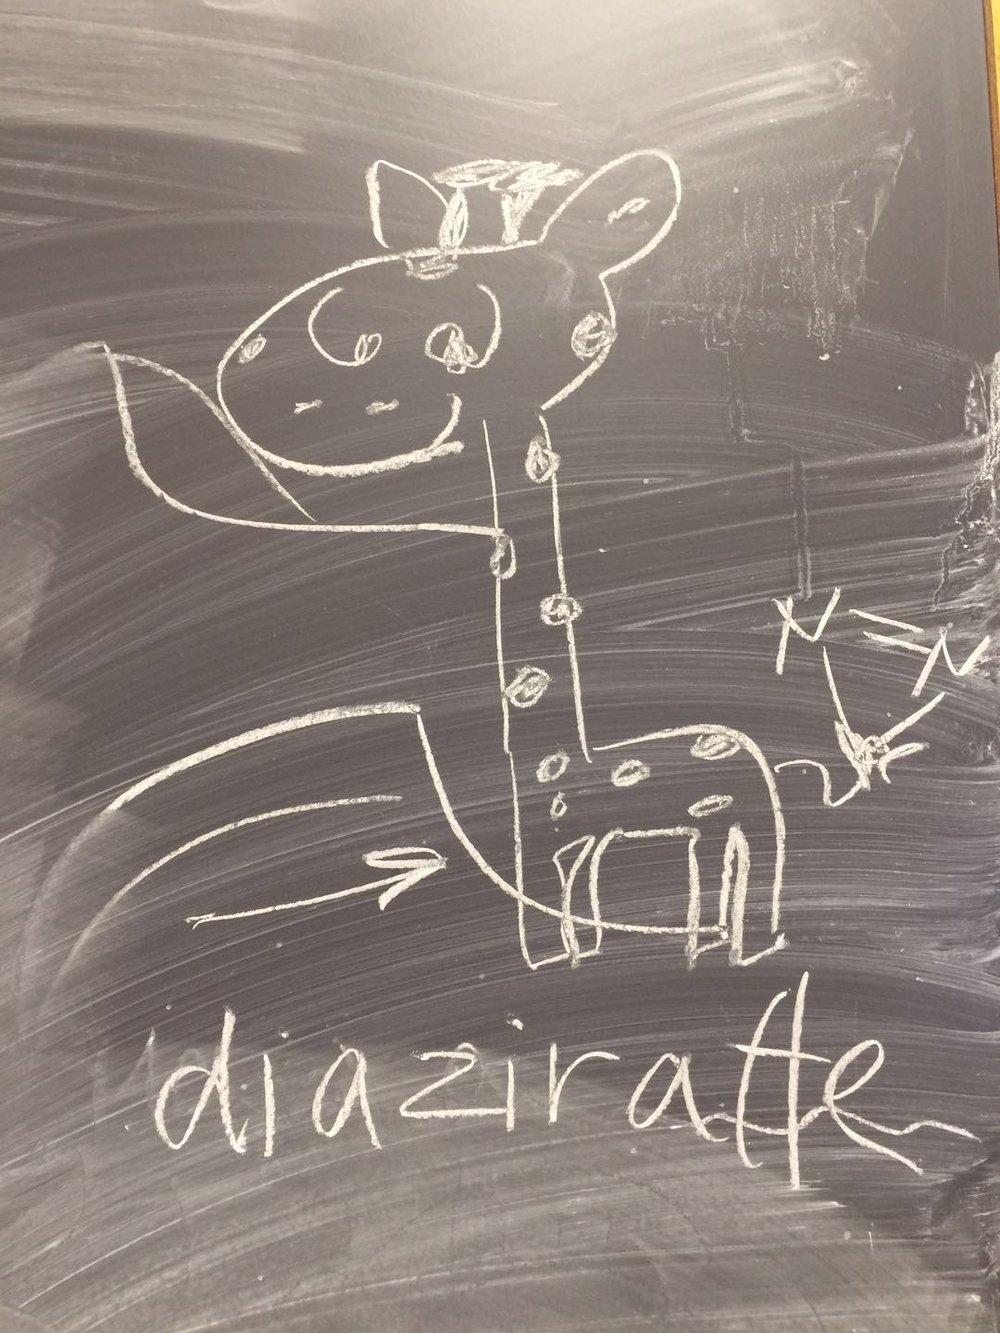 Diazirine + Giraffe = Diaziraffe